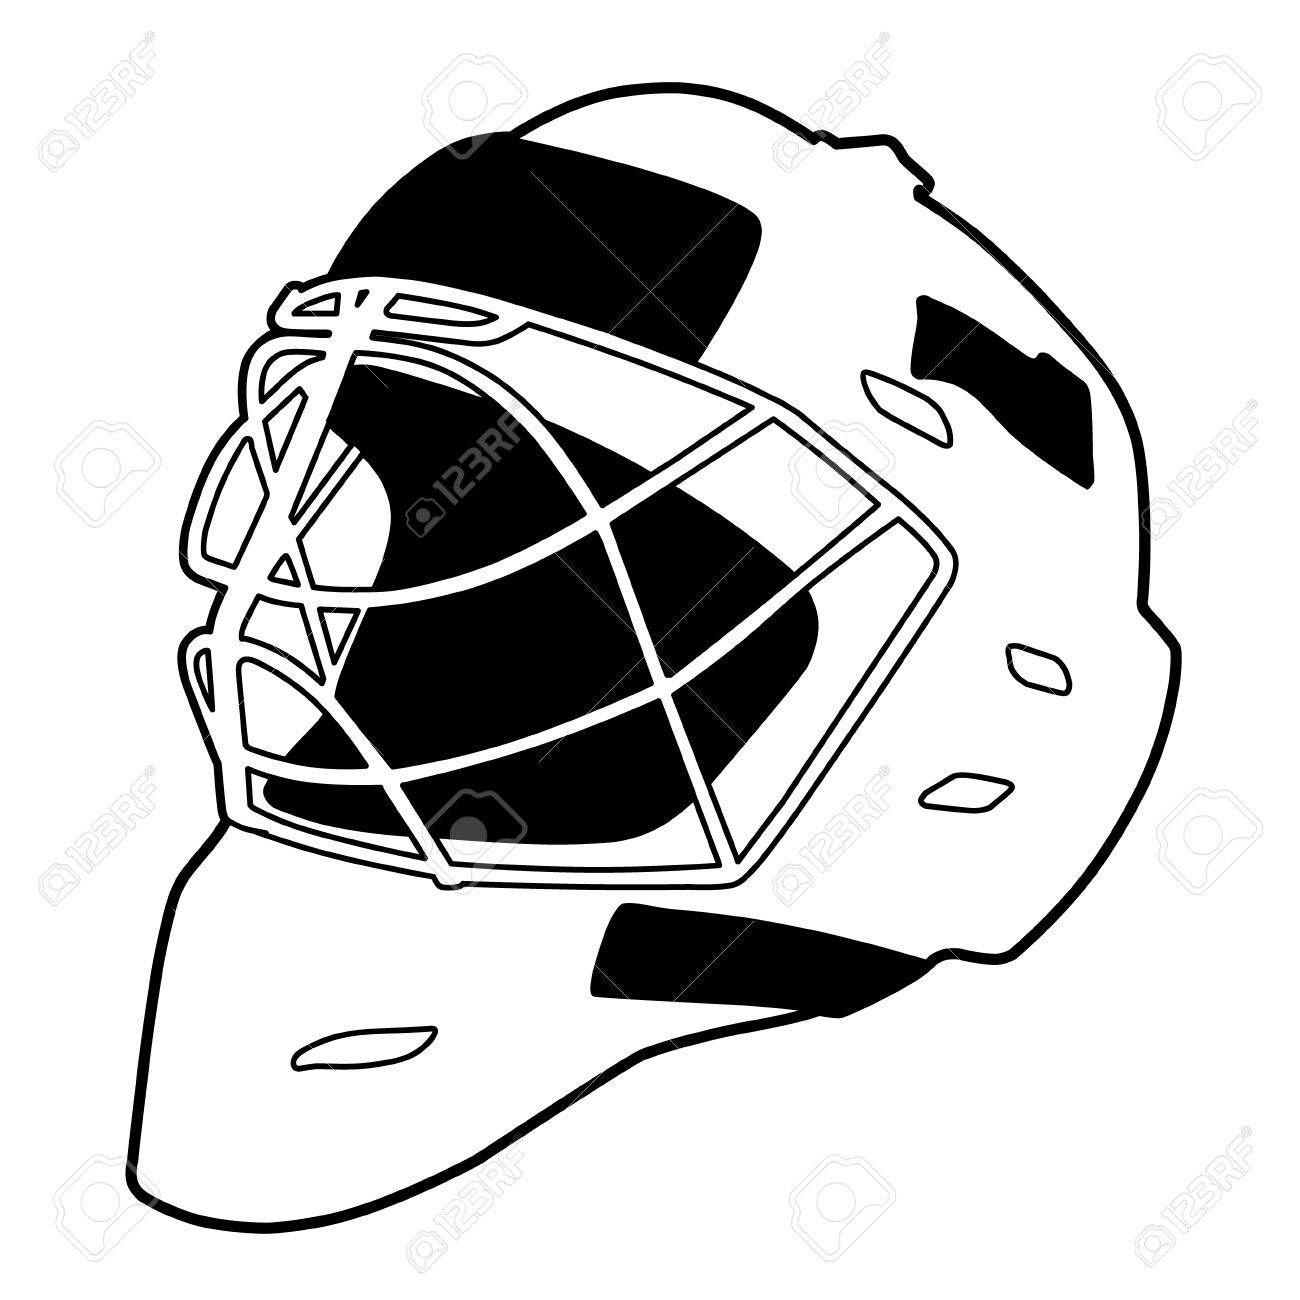 Pin By Tysondesign On A Goalie Mask Hockey Helmet Goalie